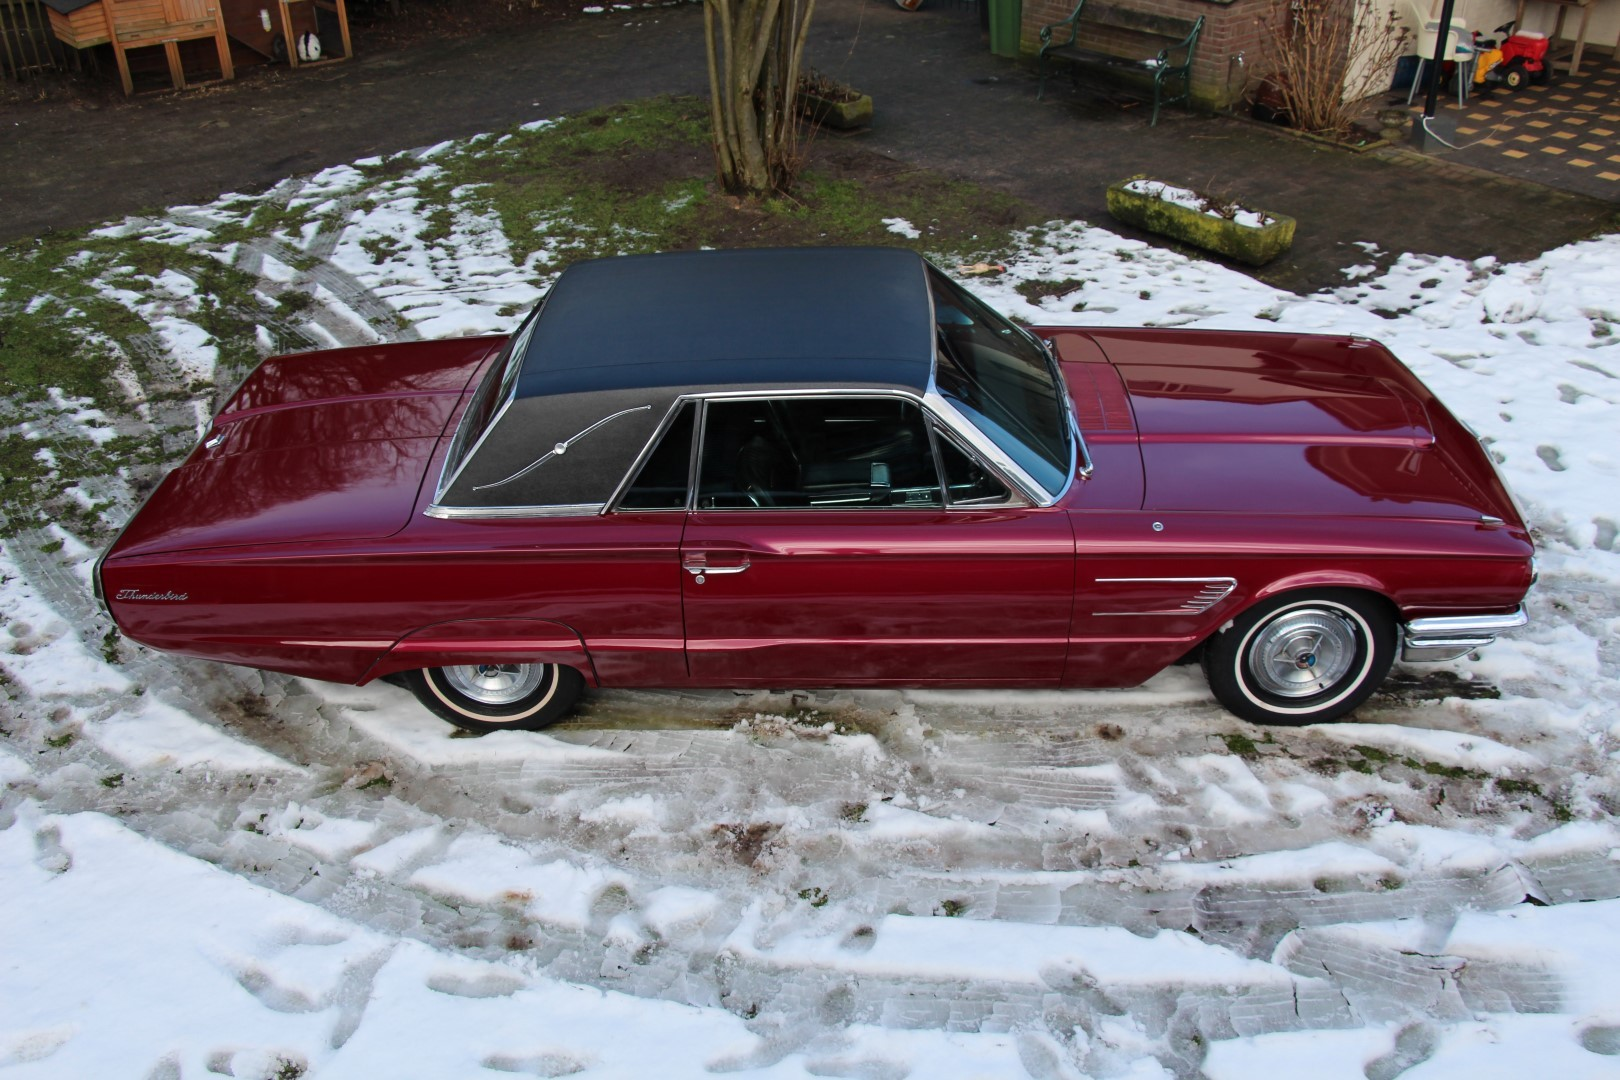 1965 Ford Thunderbird Hardtop - Burgundy new (19)